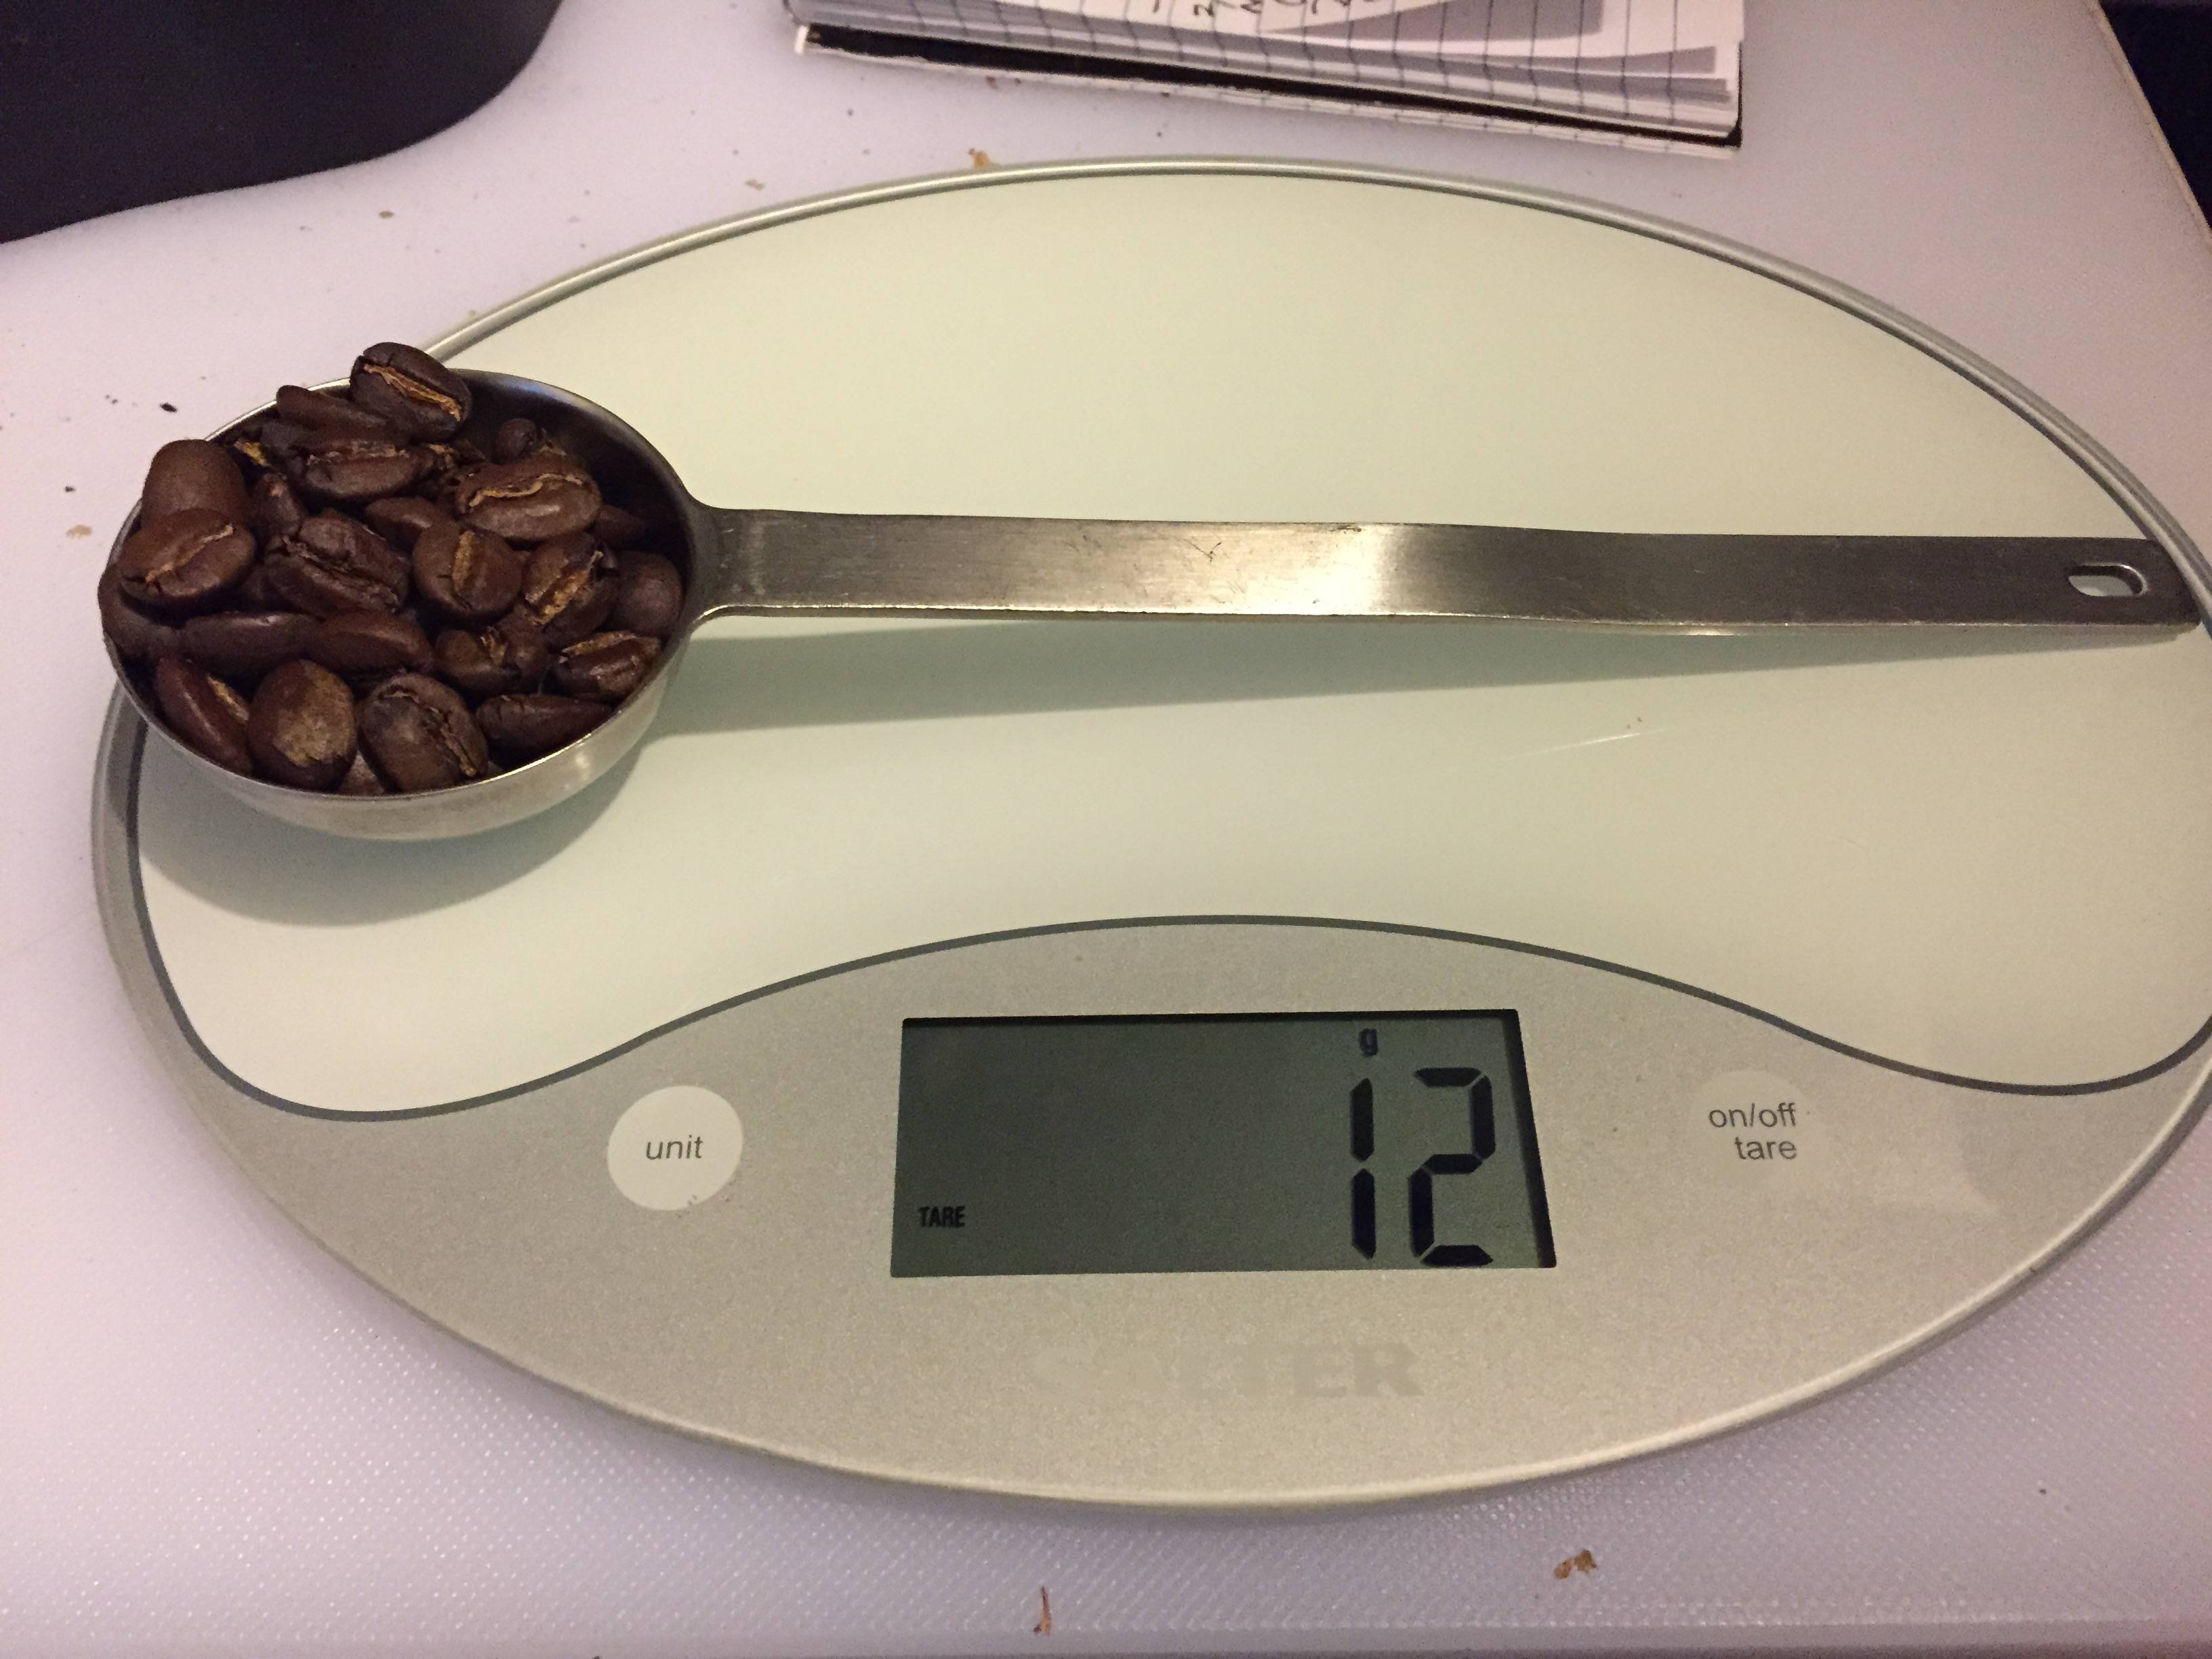 2Tbsp scoop of beans weighing 12g